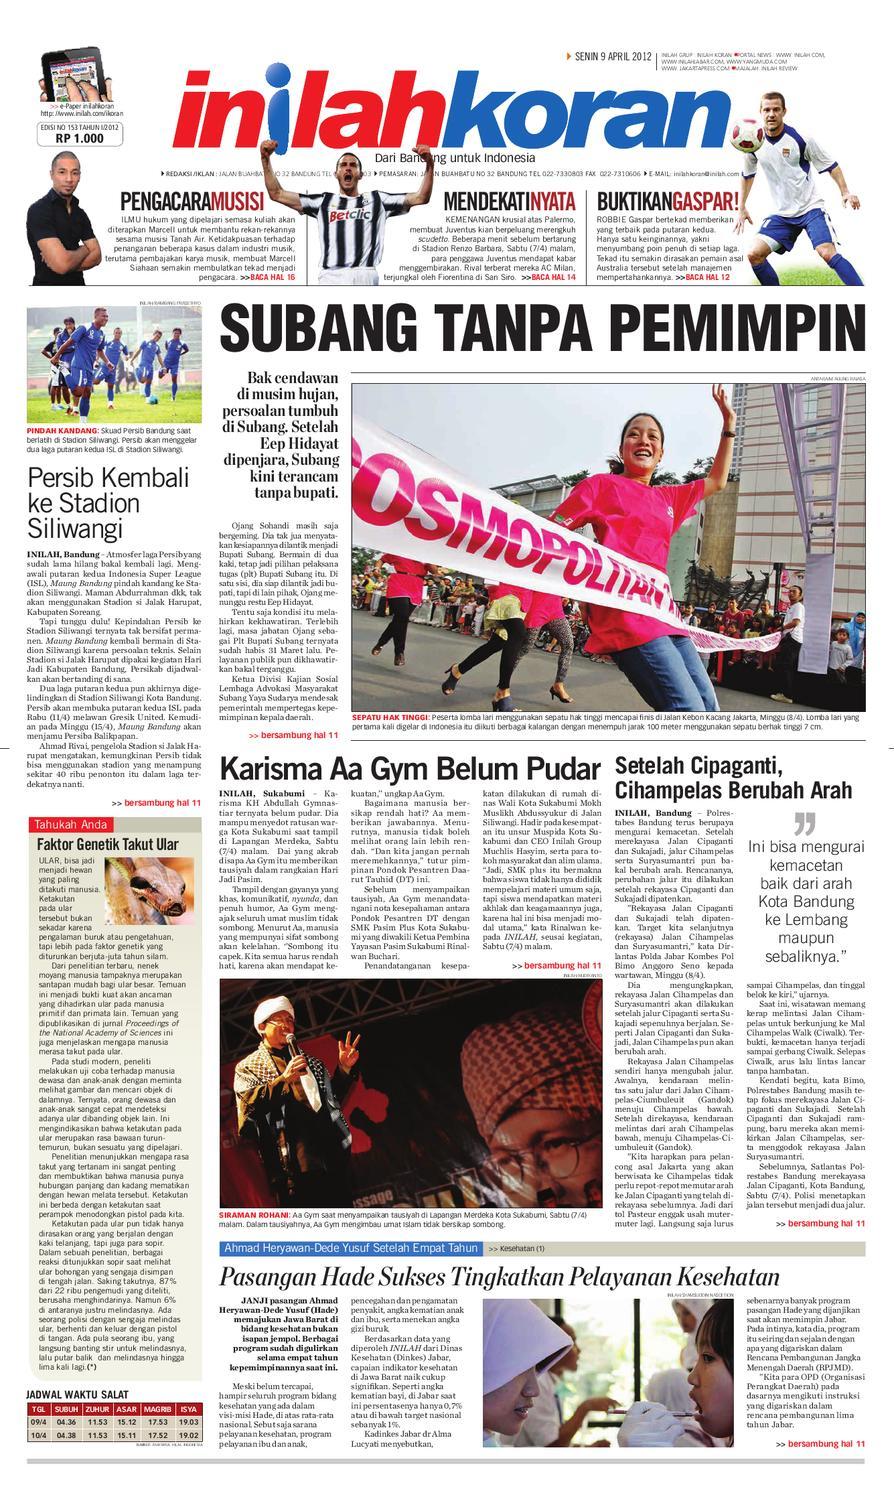 SUBANG TANPA PEMIMPIN By Inilah Koran Issuu